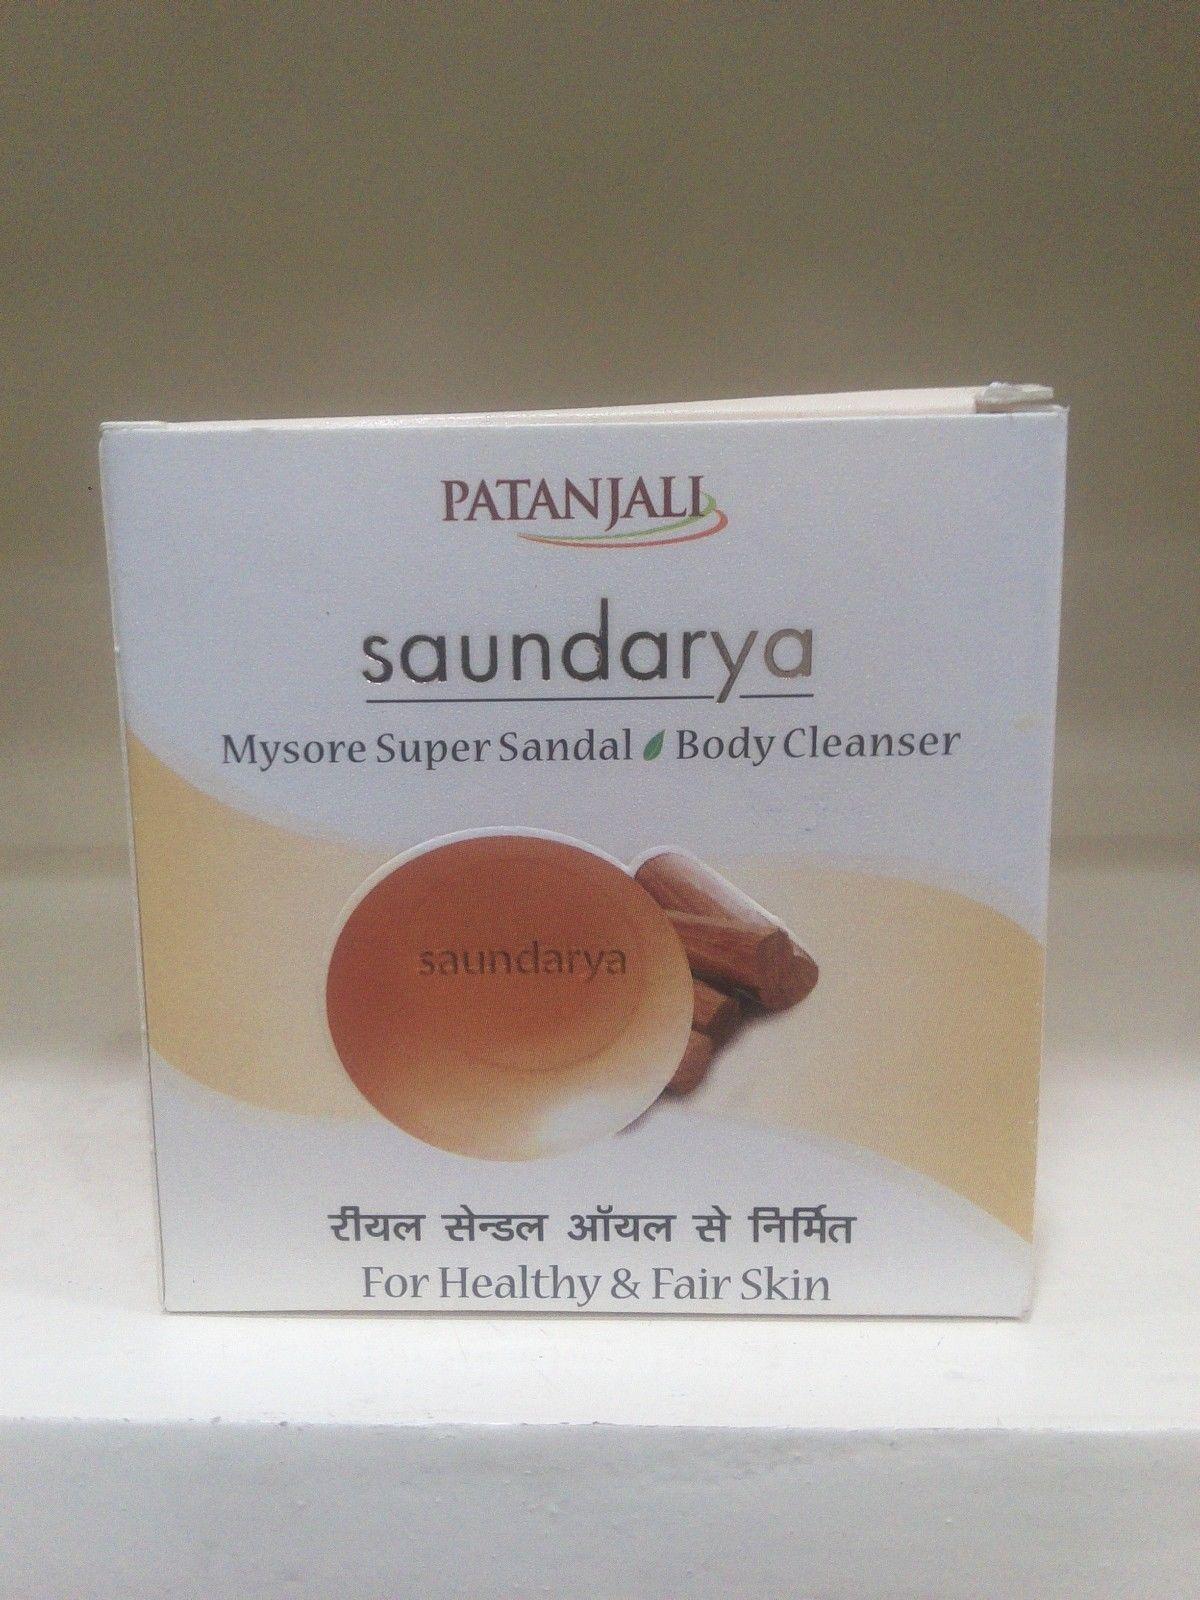 Patanjali Saundrya Sandal Soap 2x75gm Free Shipping image 2